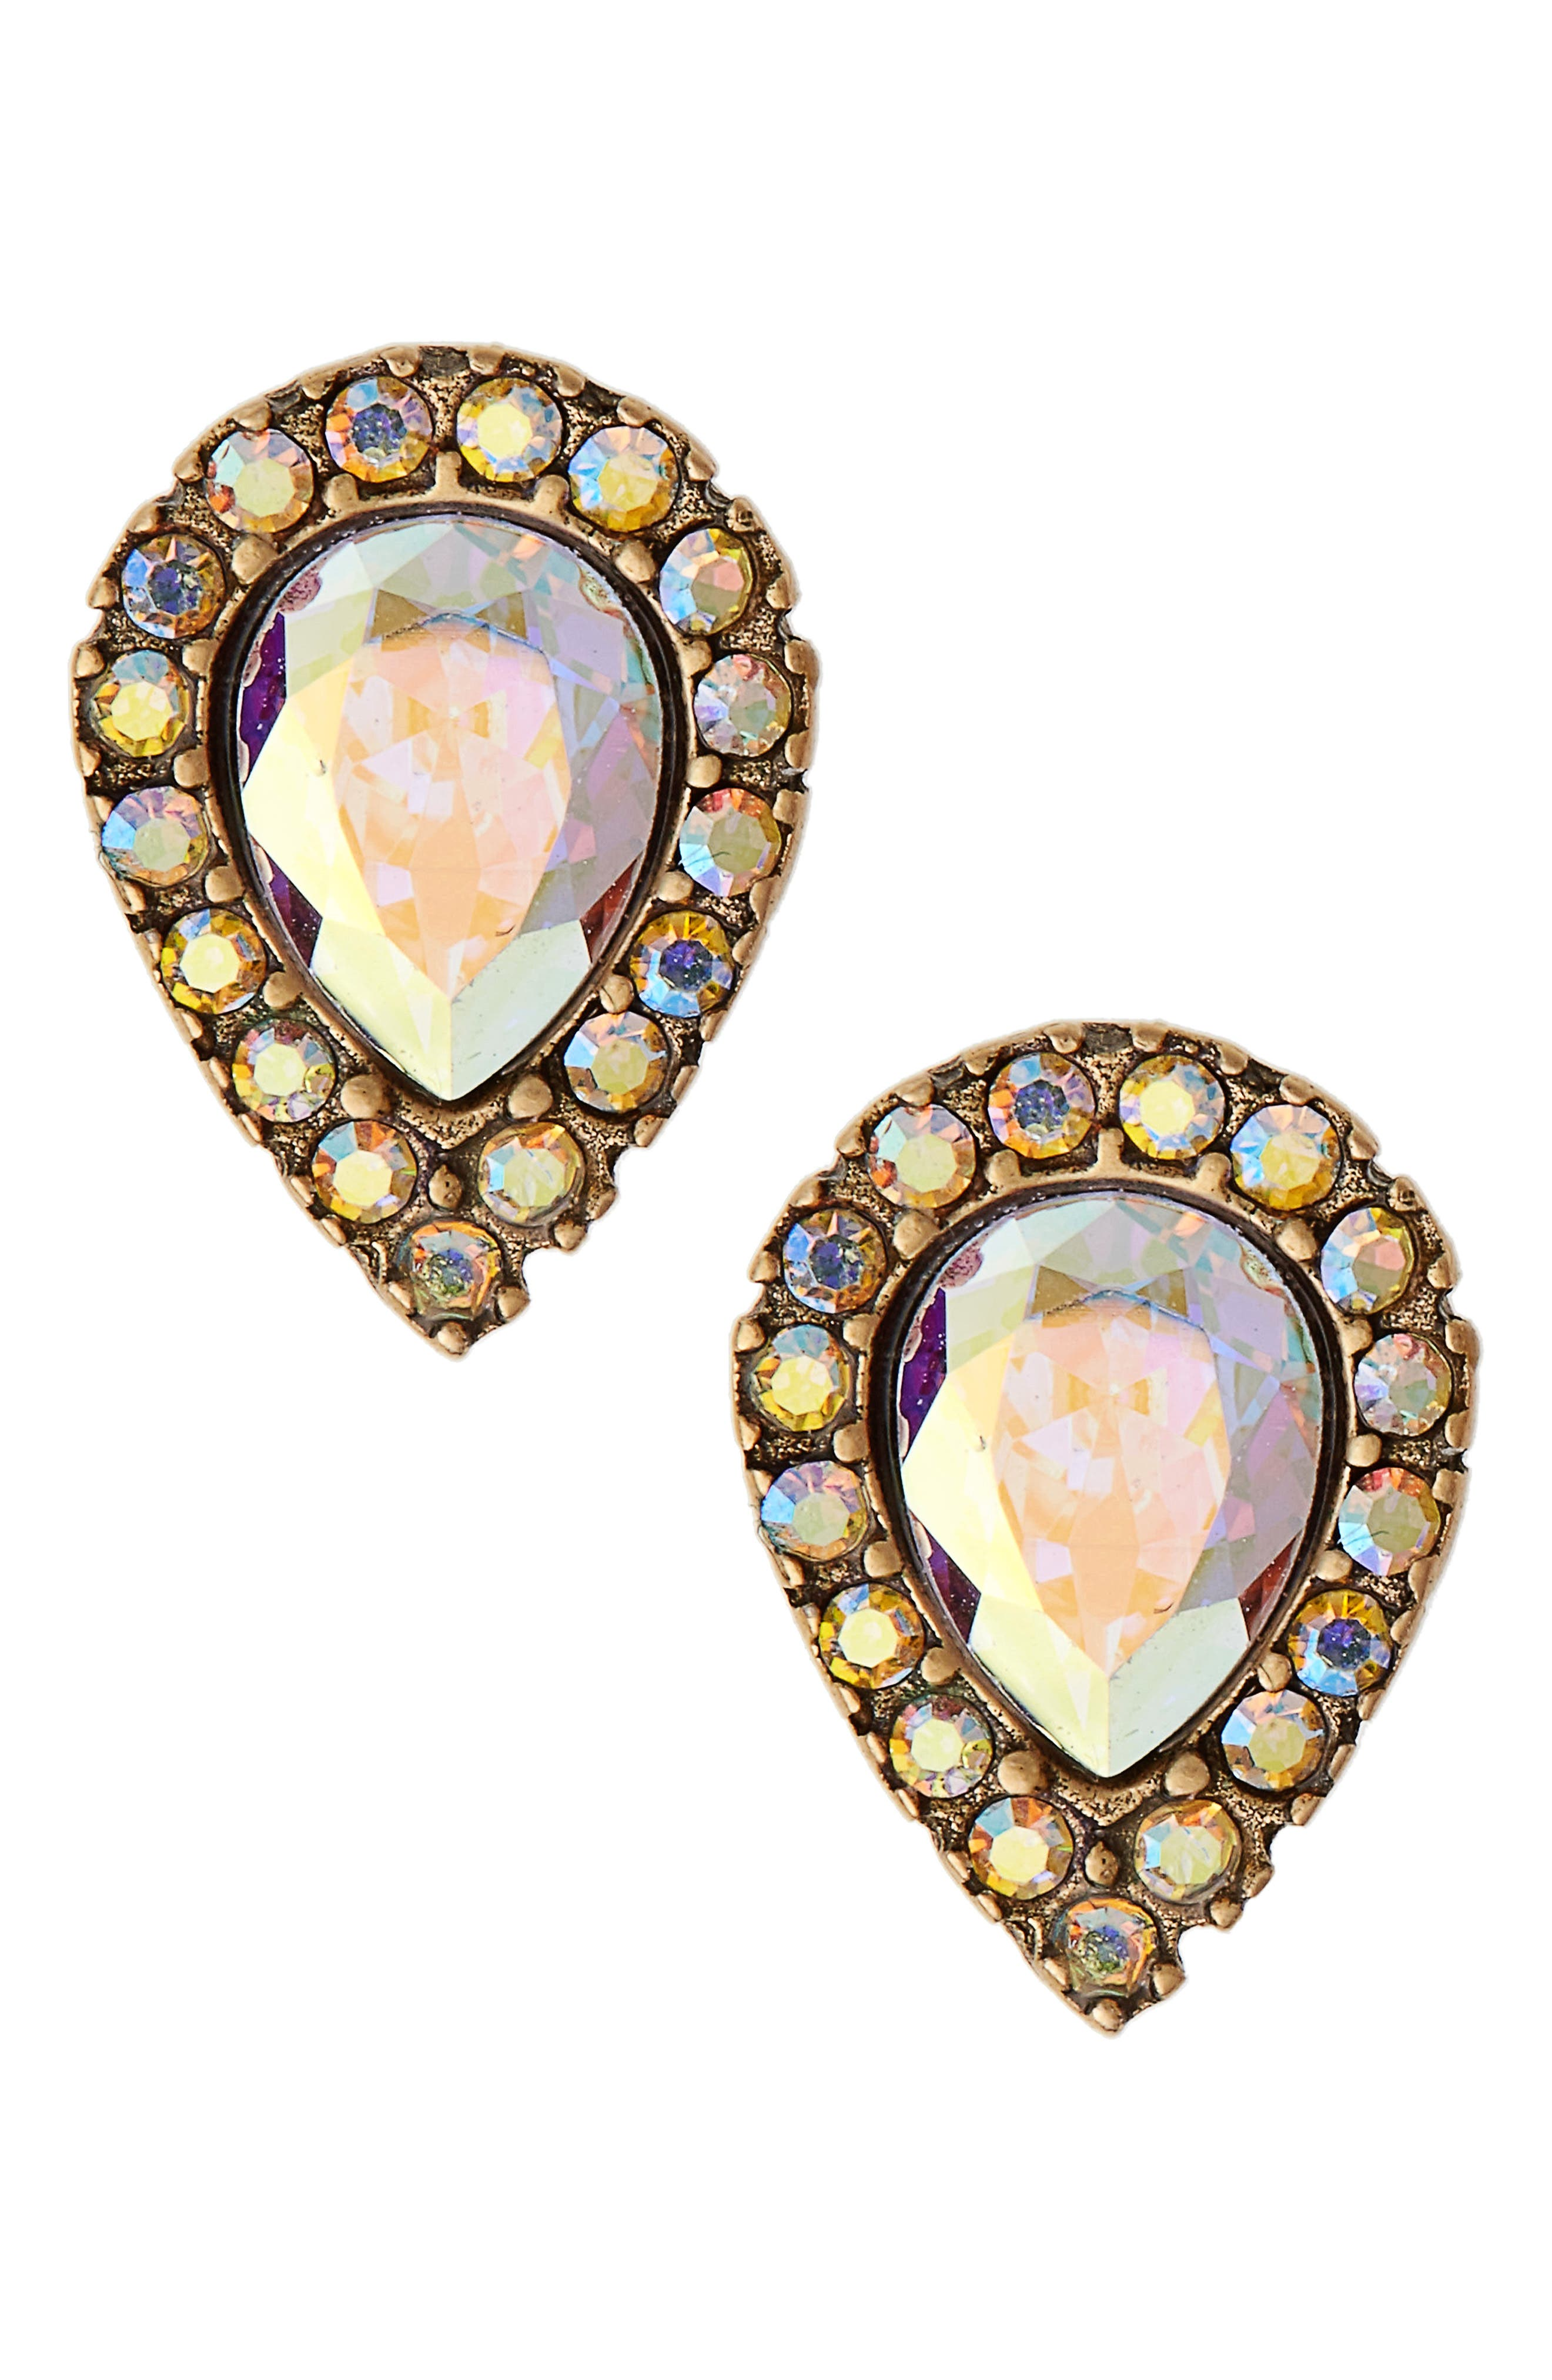 Jamie Teardrop Stud Earrings,                         Main,                         color, Gold/ Iridescent